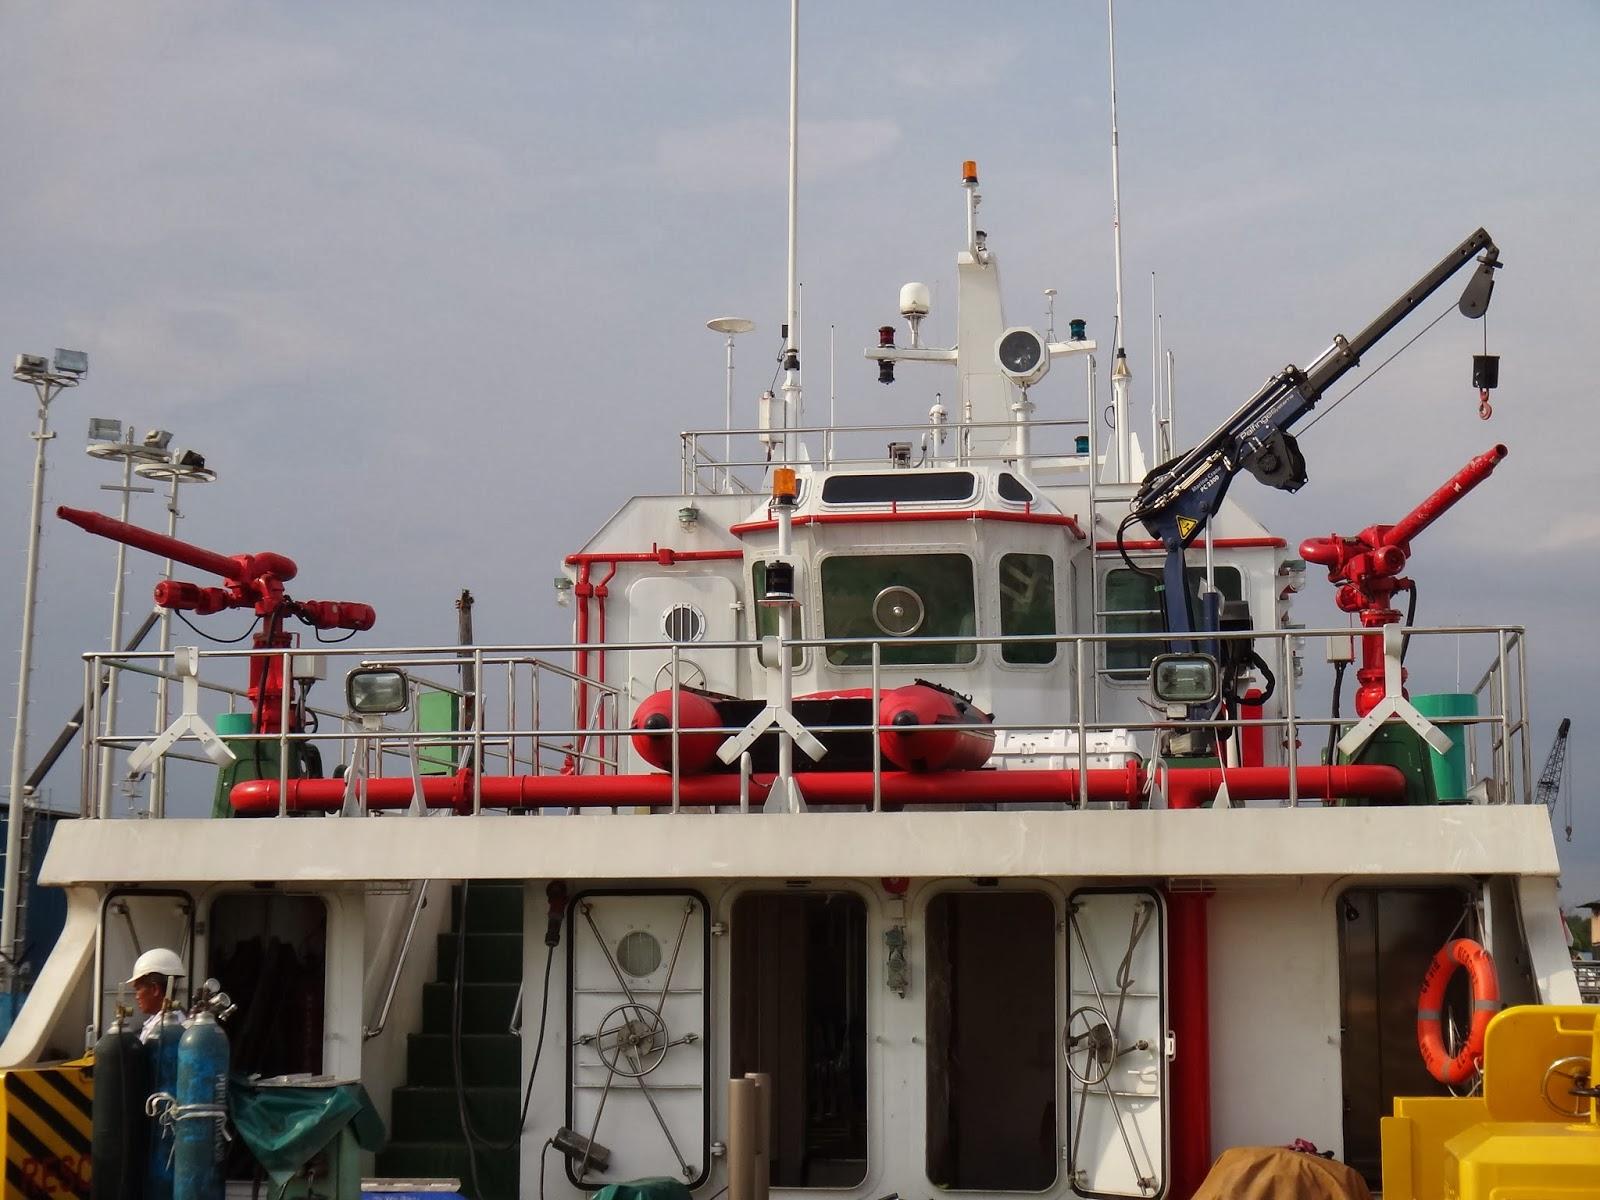 Sistem pemadam kebakaran kapal